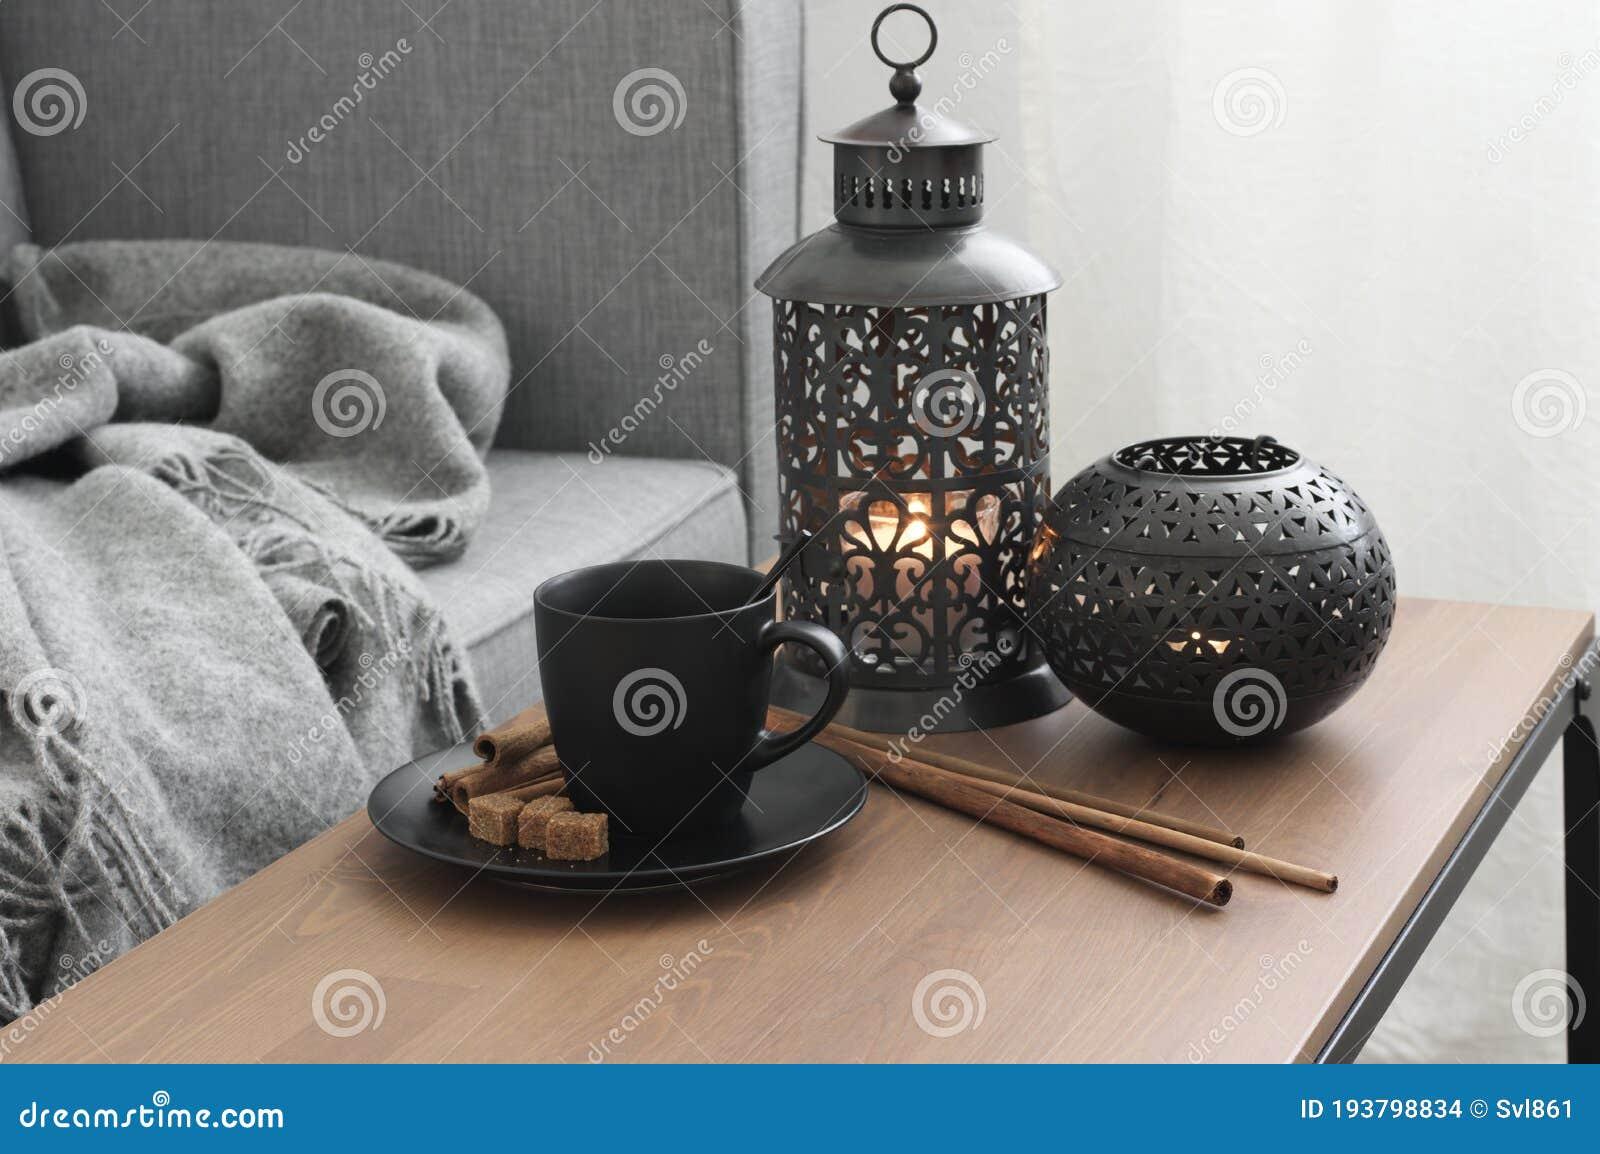 Home Interior Decor In Living Room Stock Photo Image Of Furniture Lantern 193798834